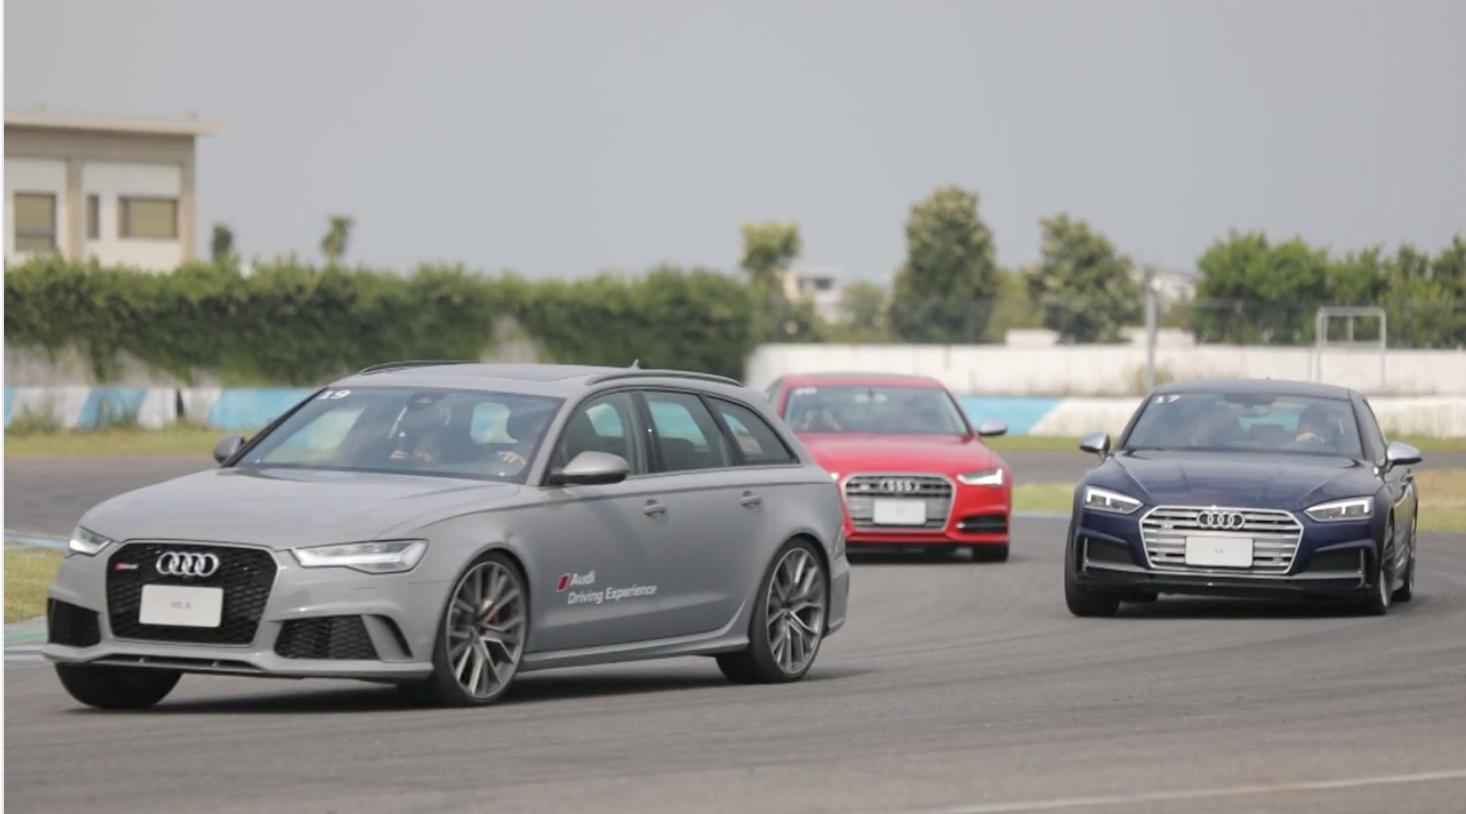 【HD影片】Audi Driving Experience|2017極限體驗營